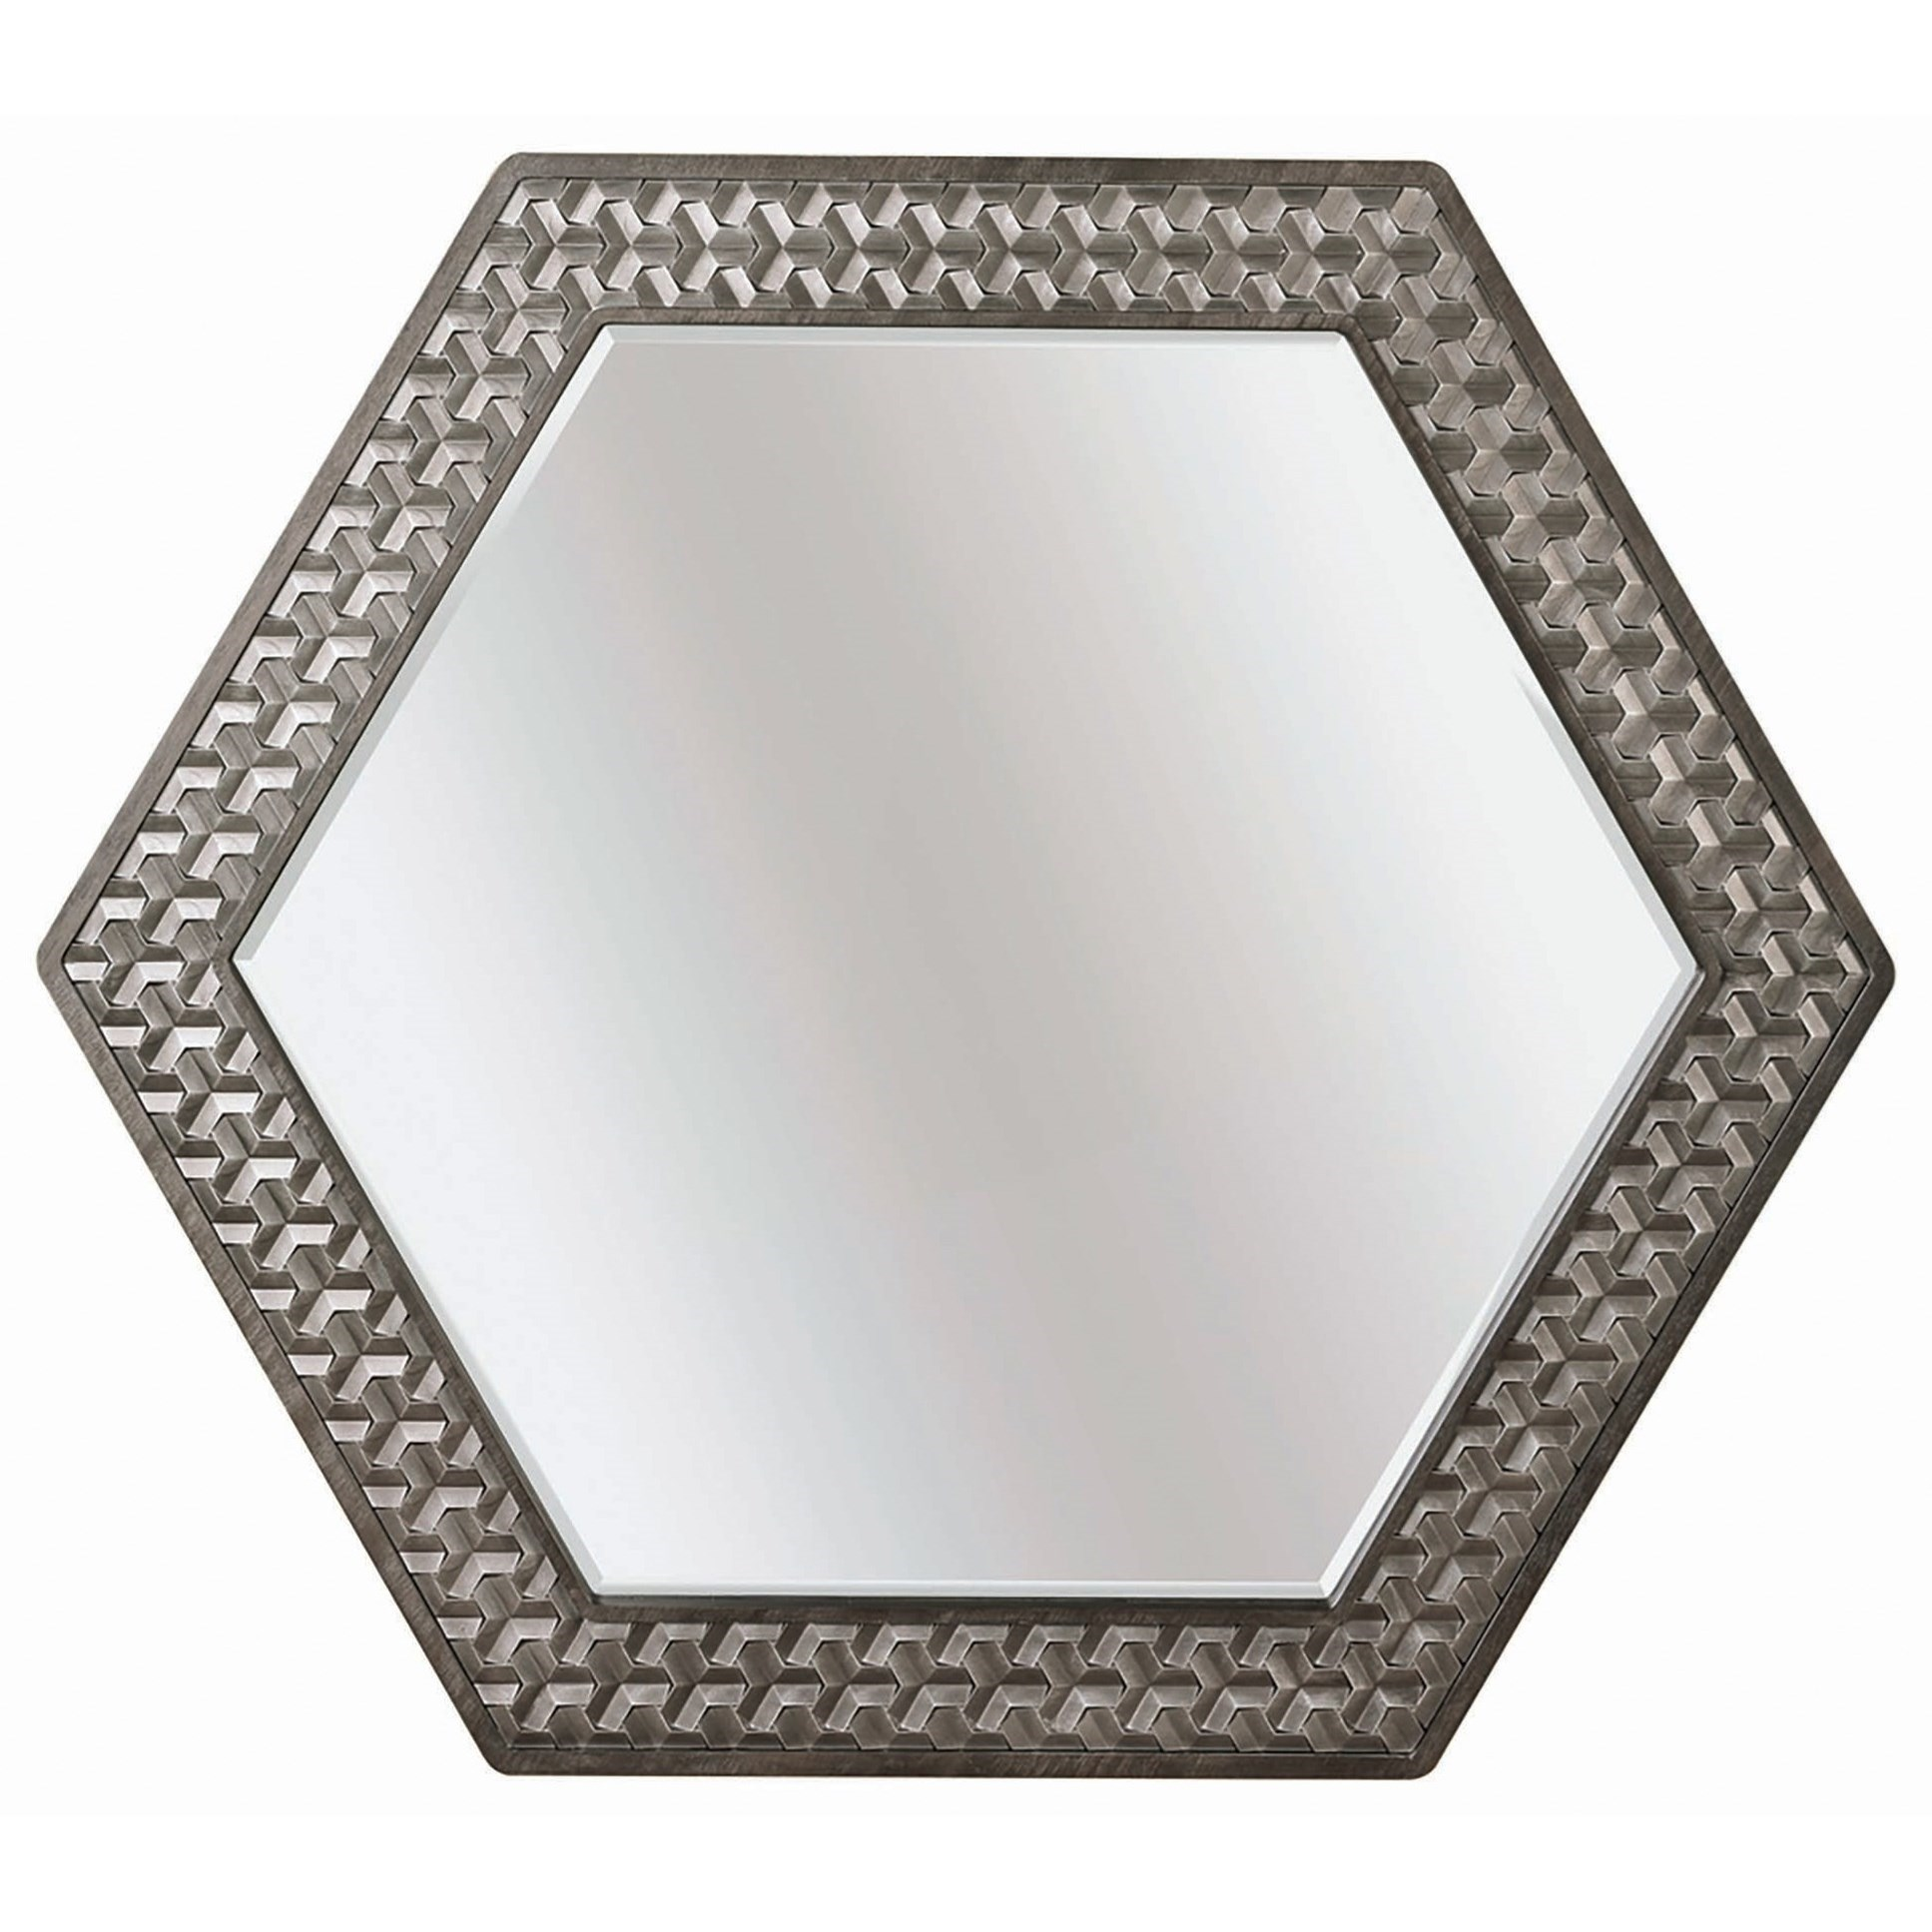 A.R.T. Furniture Inc Geode Citrine Mirror - Item Number: 238120-2303